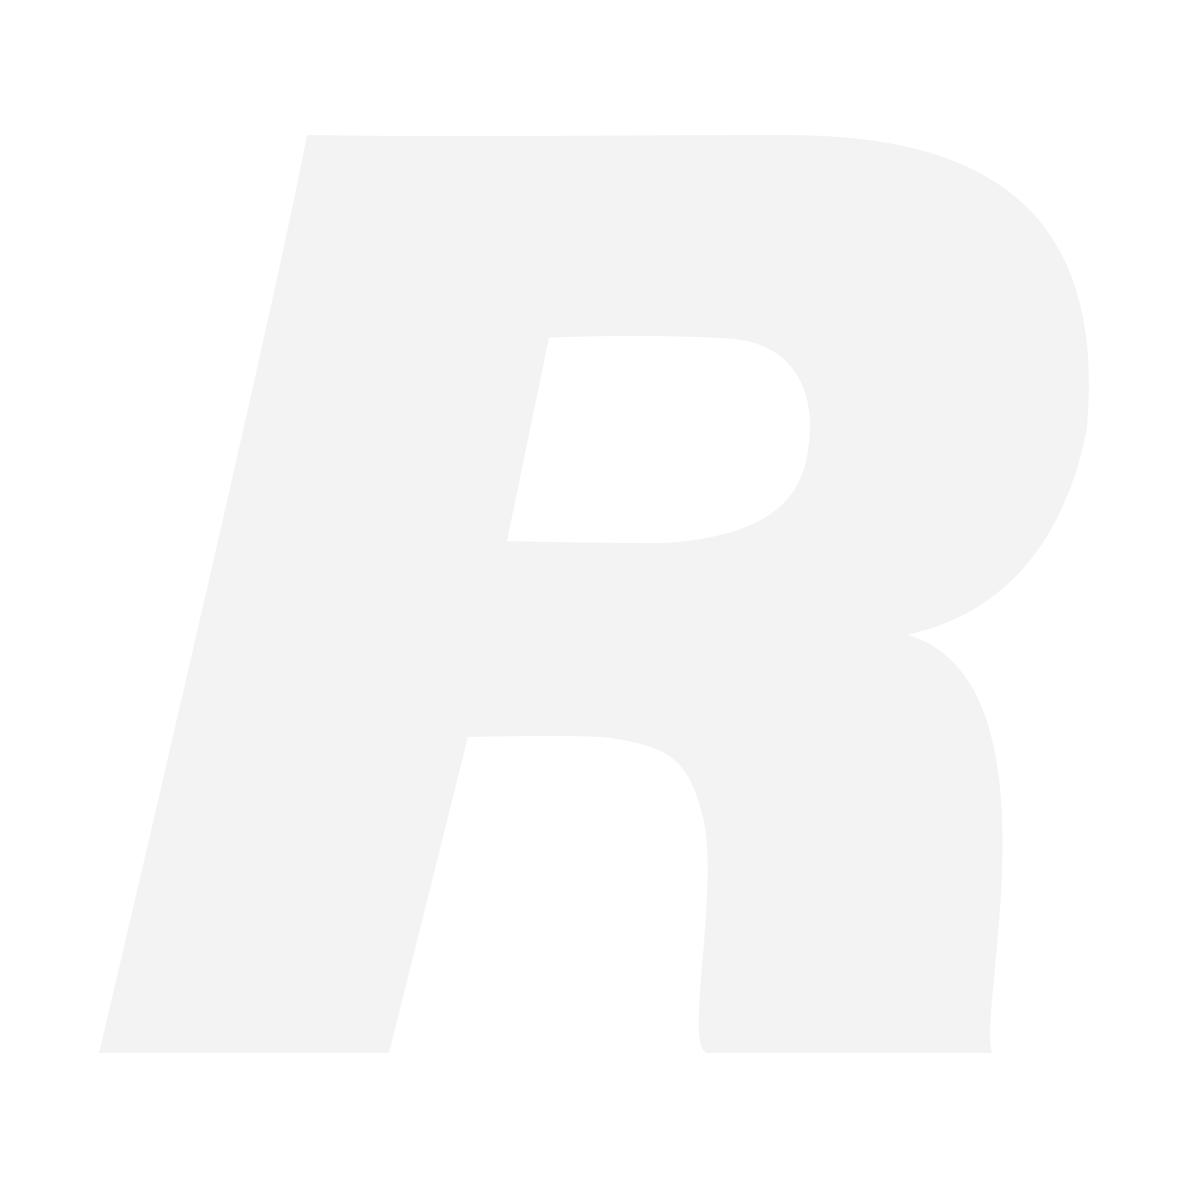 Canon Drop-In Filter EF - EOS R -adapter + CIR-PL Filter